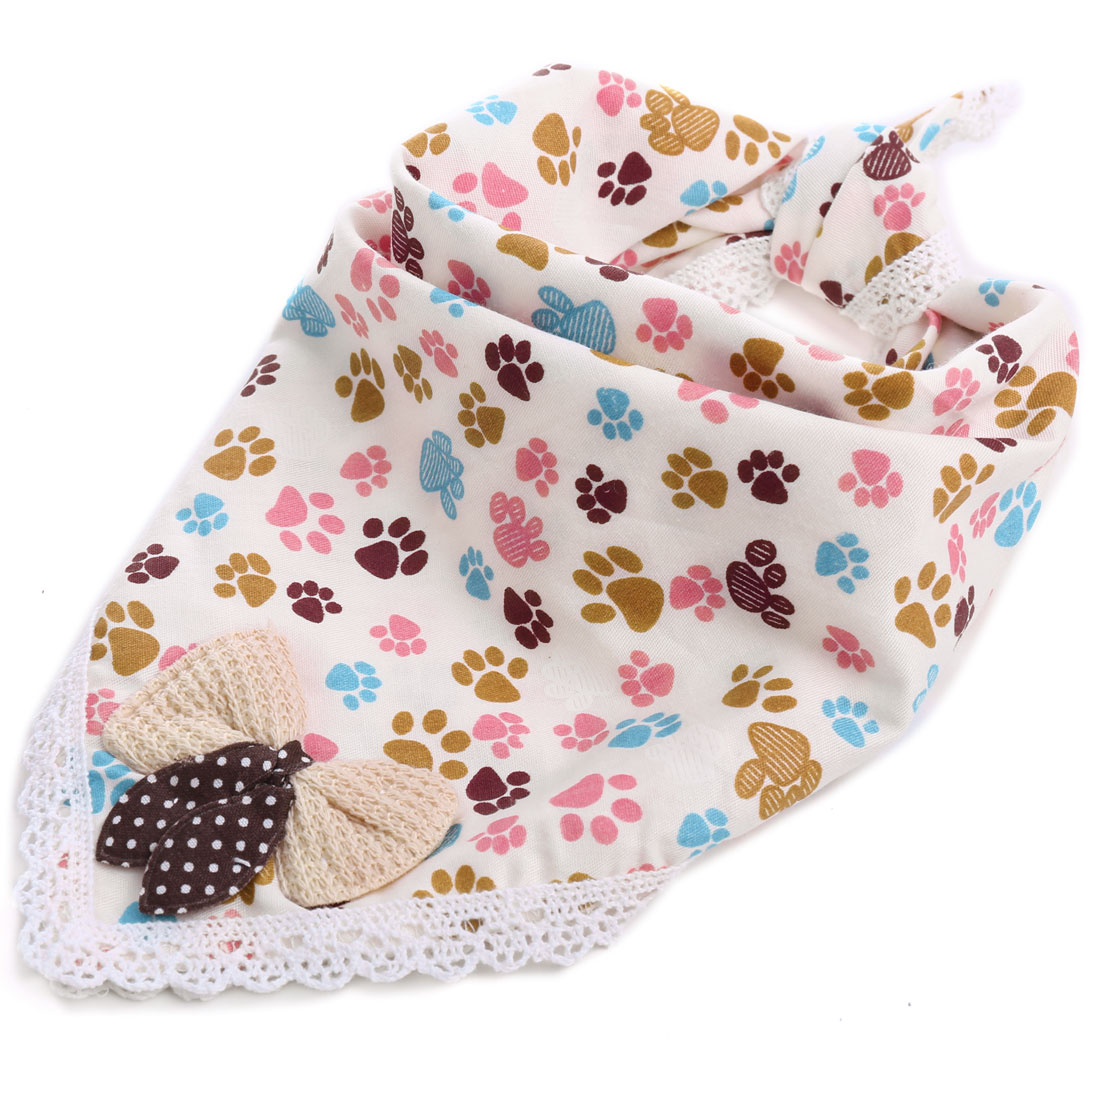 Baby Cartoon Dog Foot Prints Crochet Hem Bowtie Square Napkin Beige